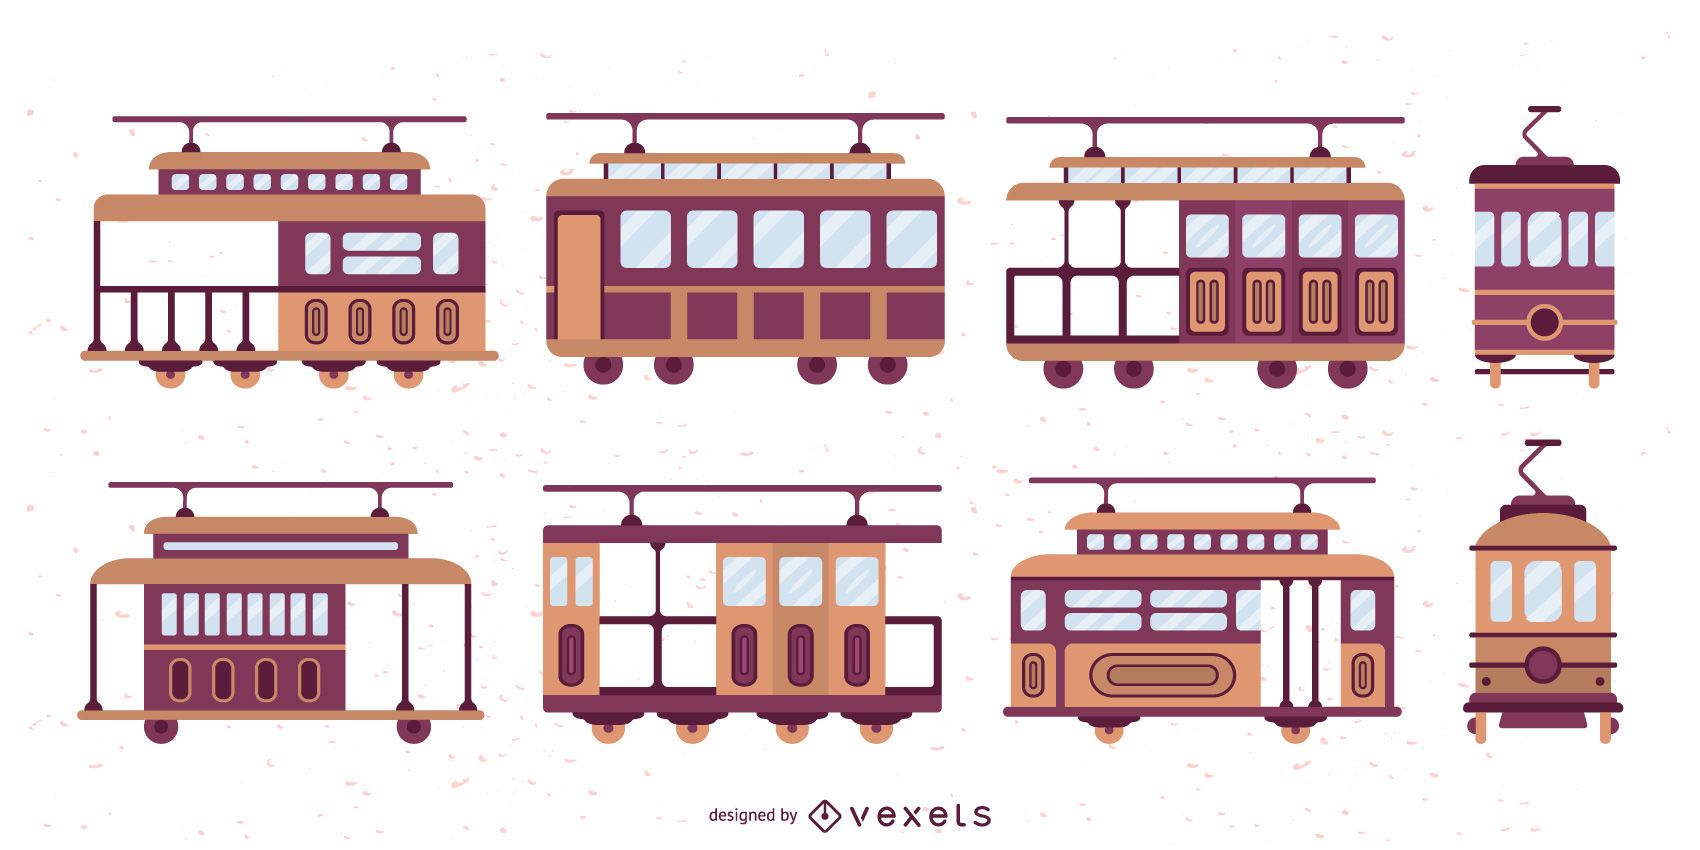 Trolley Car Flat Design Illustration Set